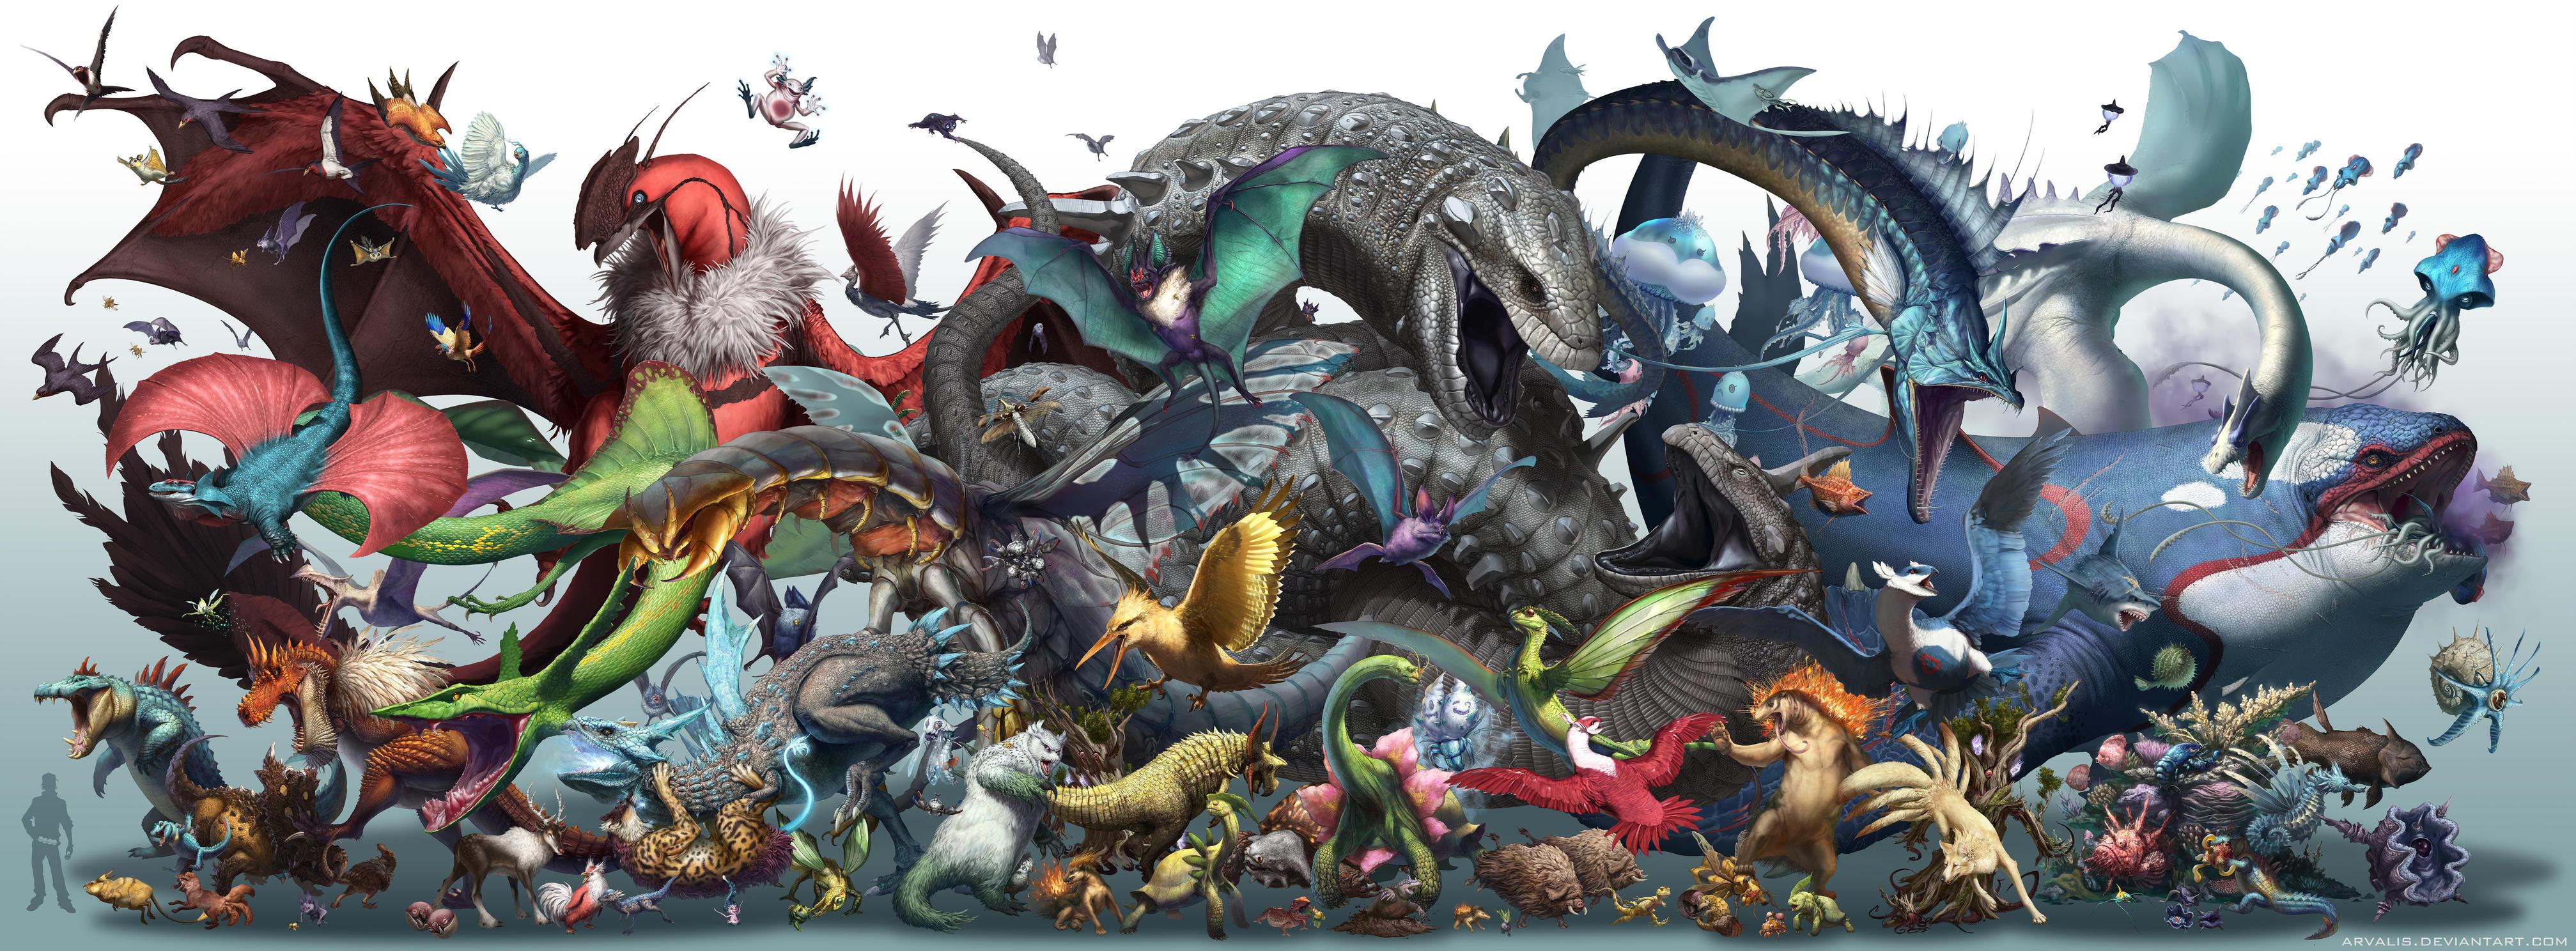 Realistic Pokemon-Season 2 by arvalis